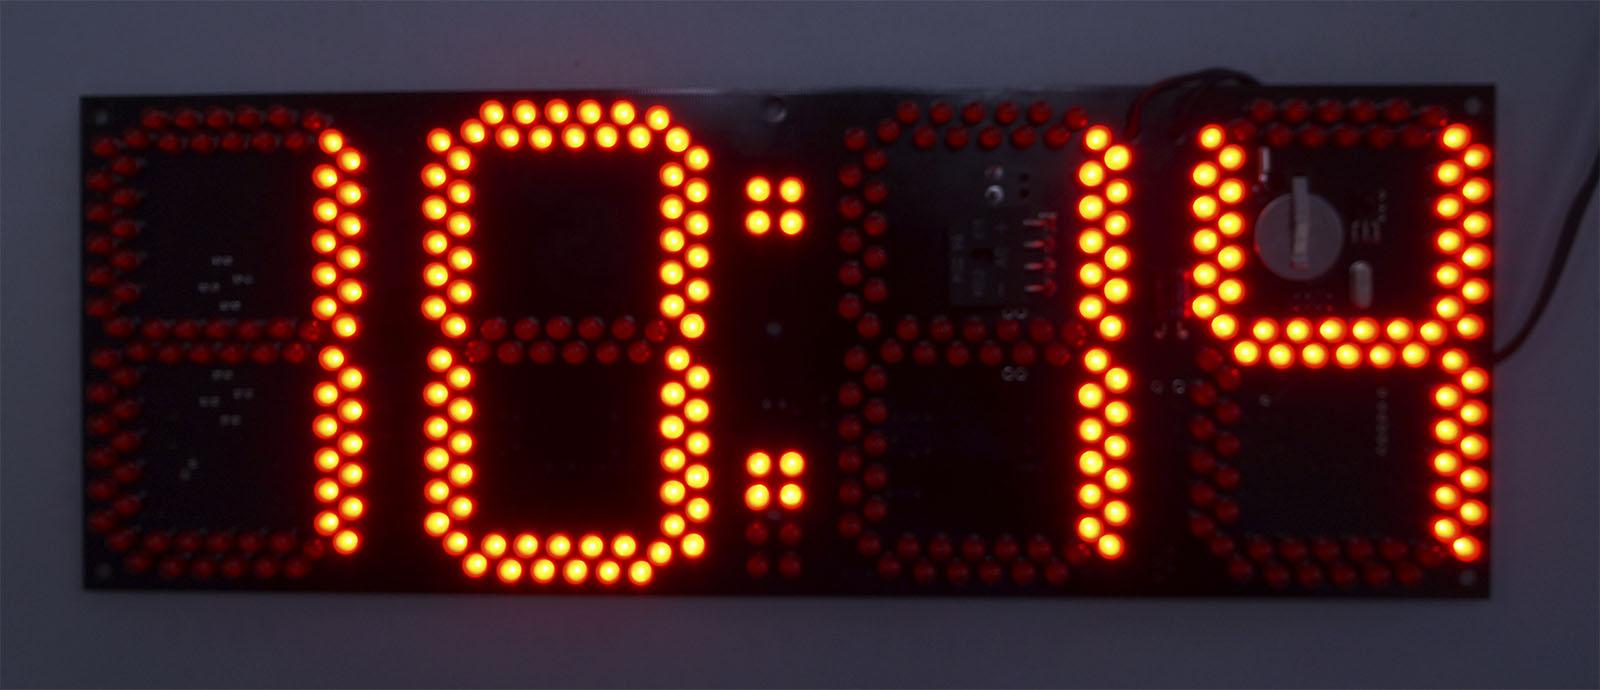 Цифровые часы сегментные